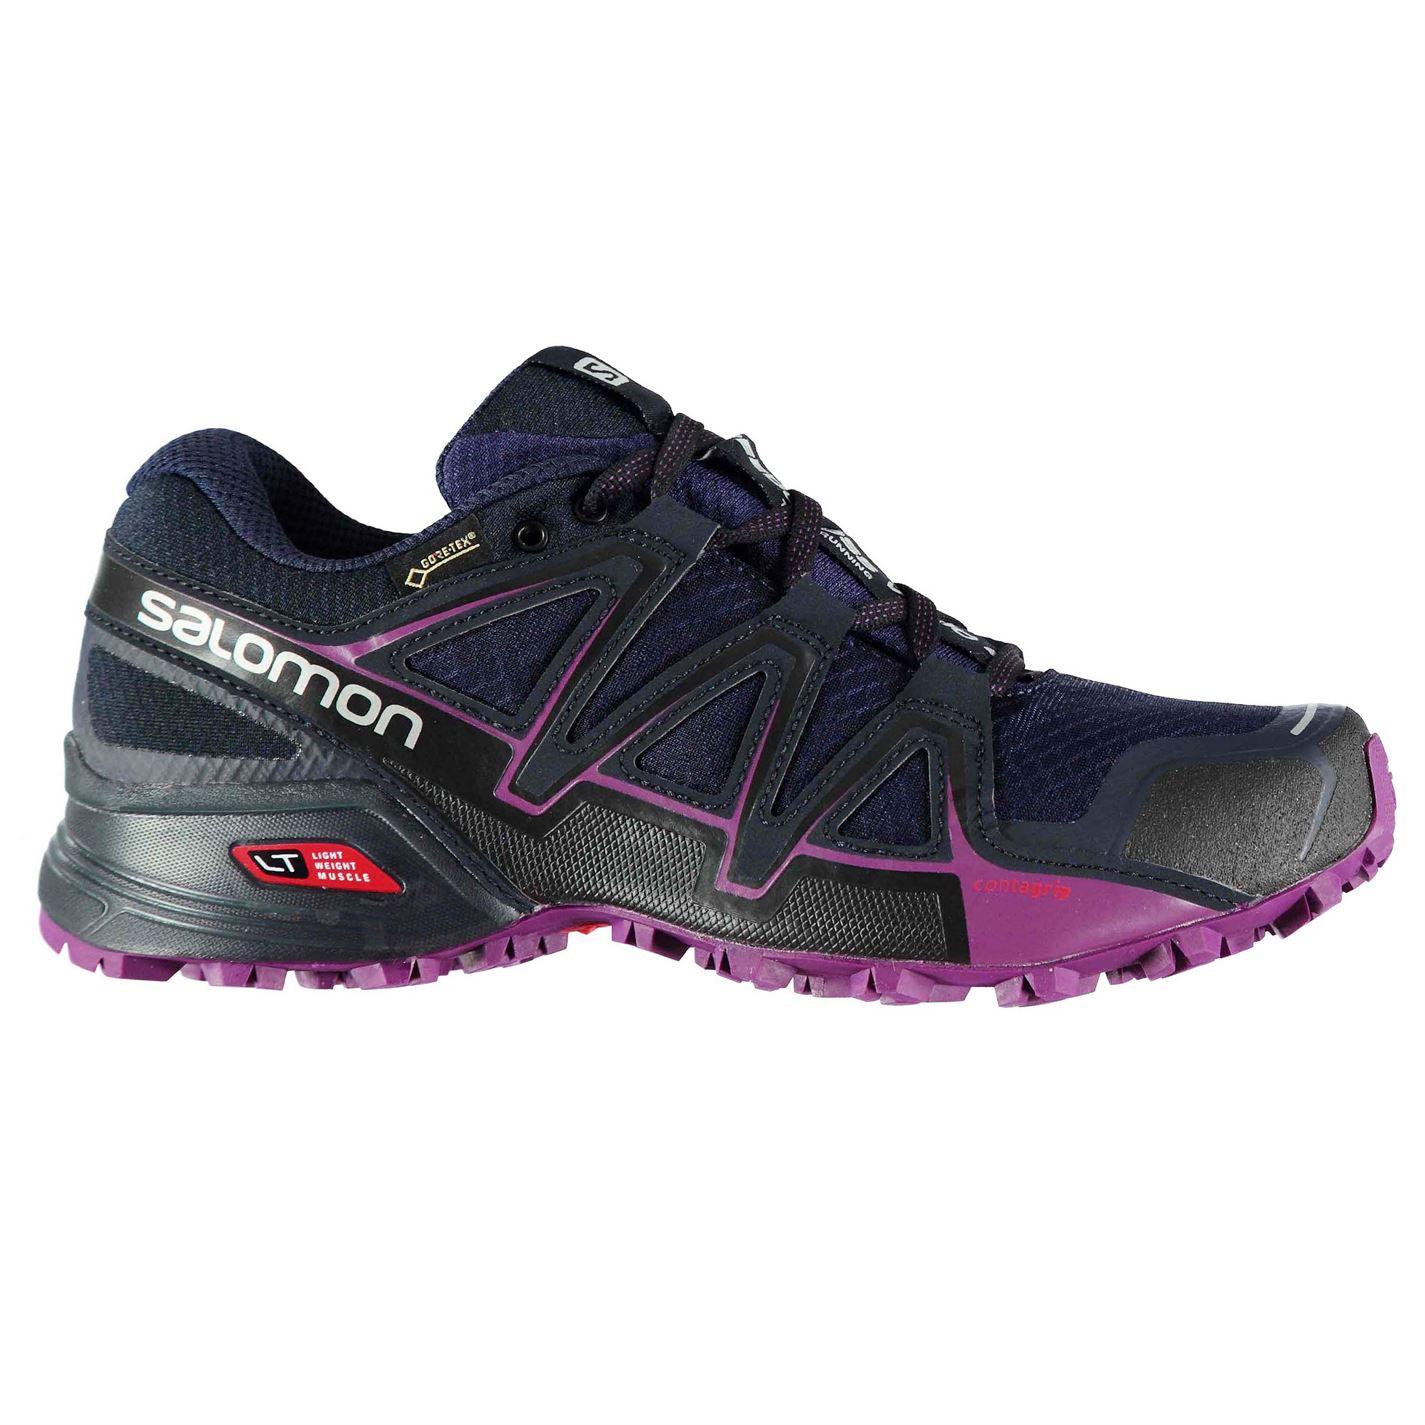 boty Salomon Speedcross V GTX dámské Trail Running Shoes